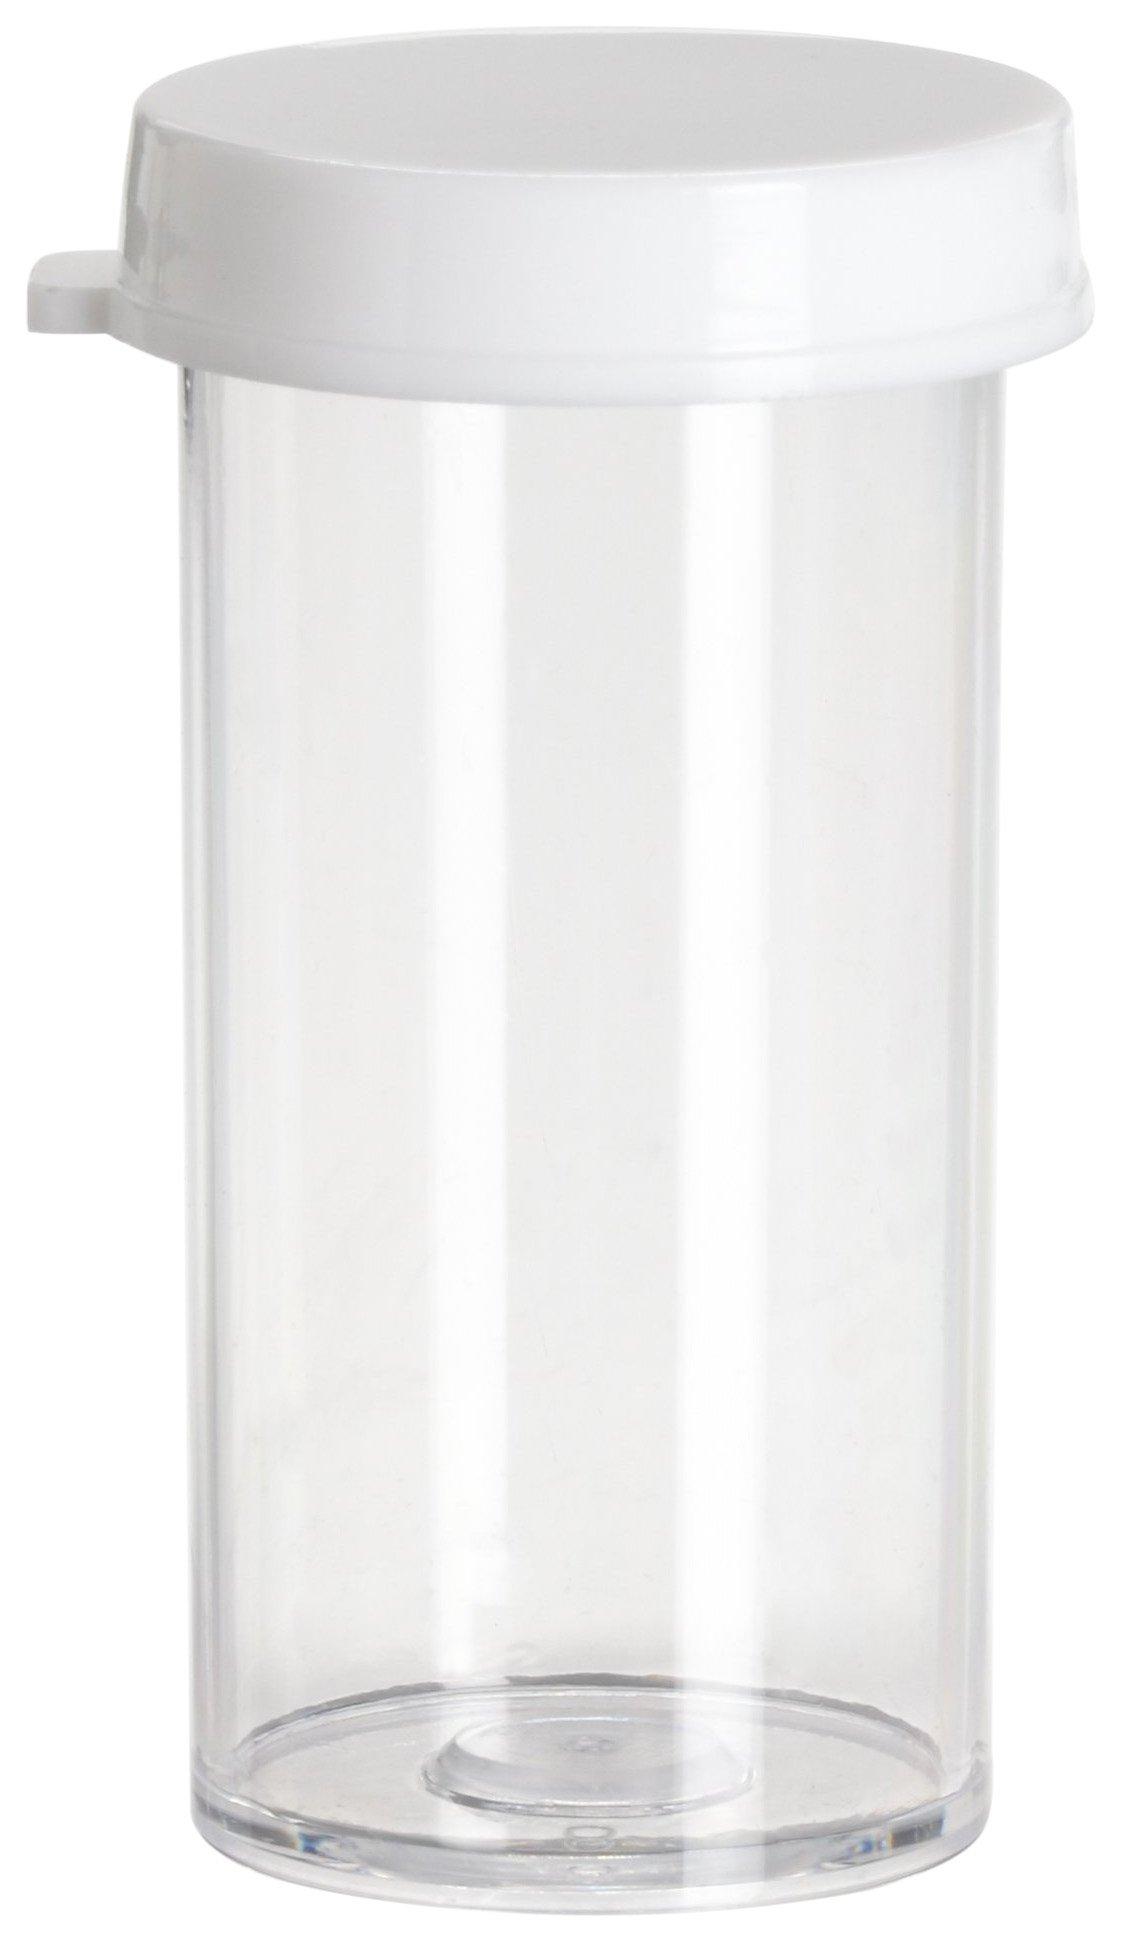 Bel-Art Snap Cap Styrene Vials; 5 dram (19ml), PE Cap (Pack of 144) (F17575-0005)